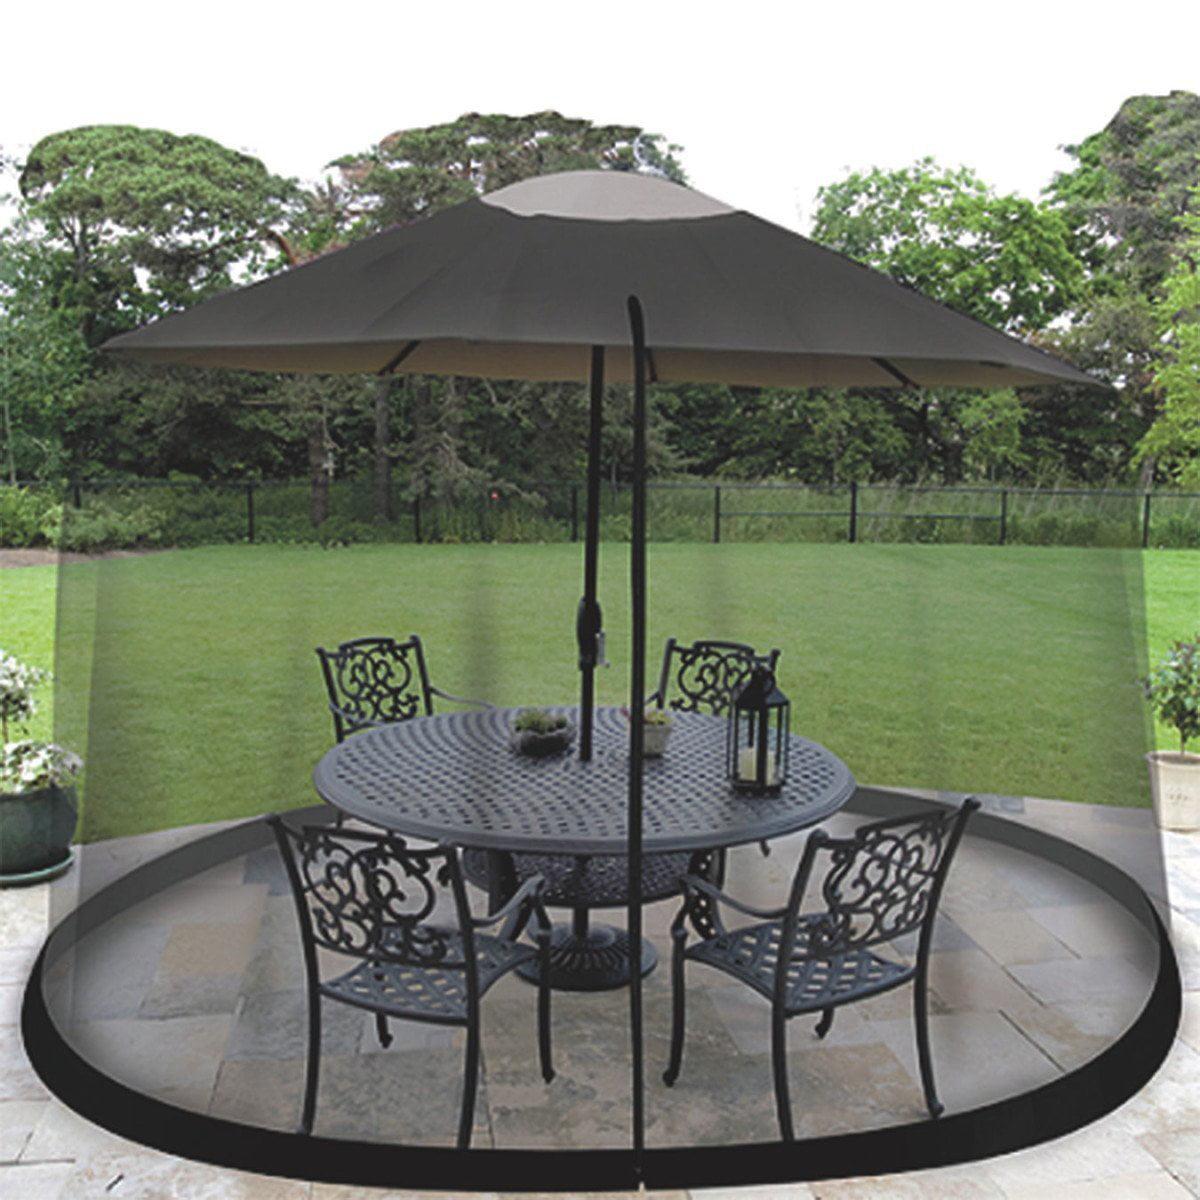 ideaworks jb5677 outdoor 75 foot umbrella table screen black walmartcom - Patio Table Umbrella